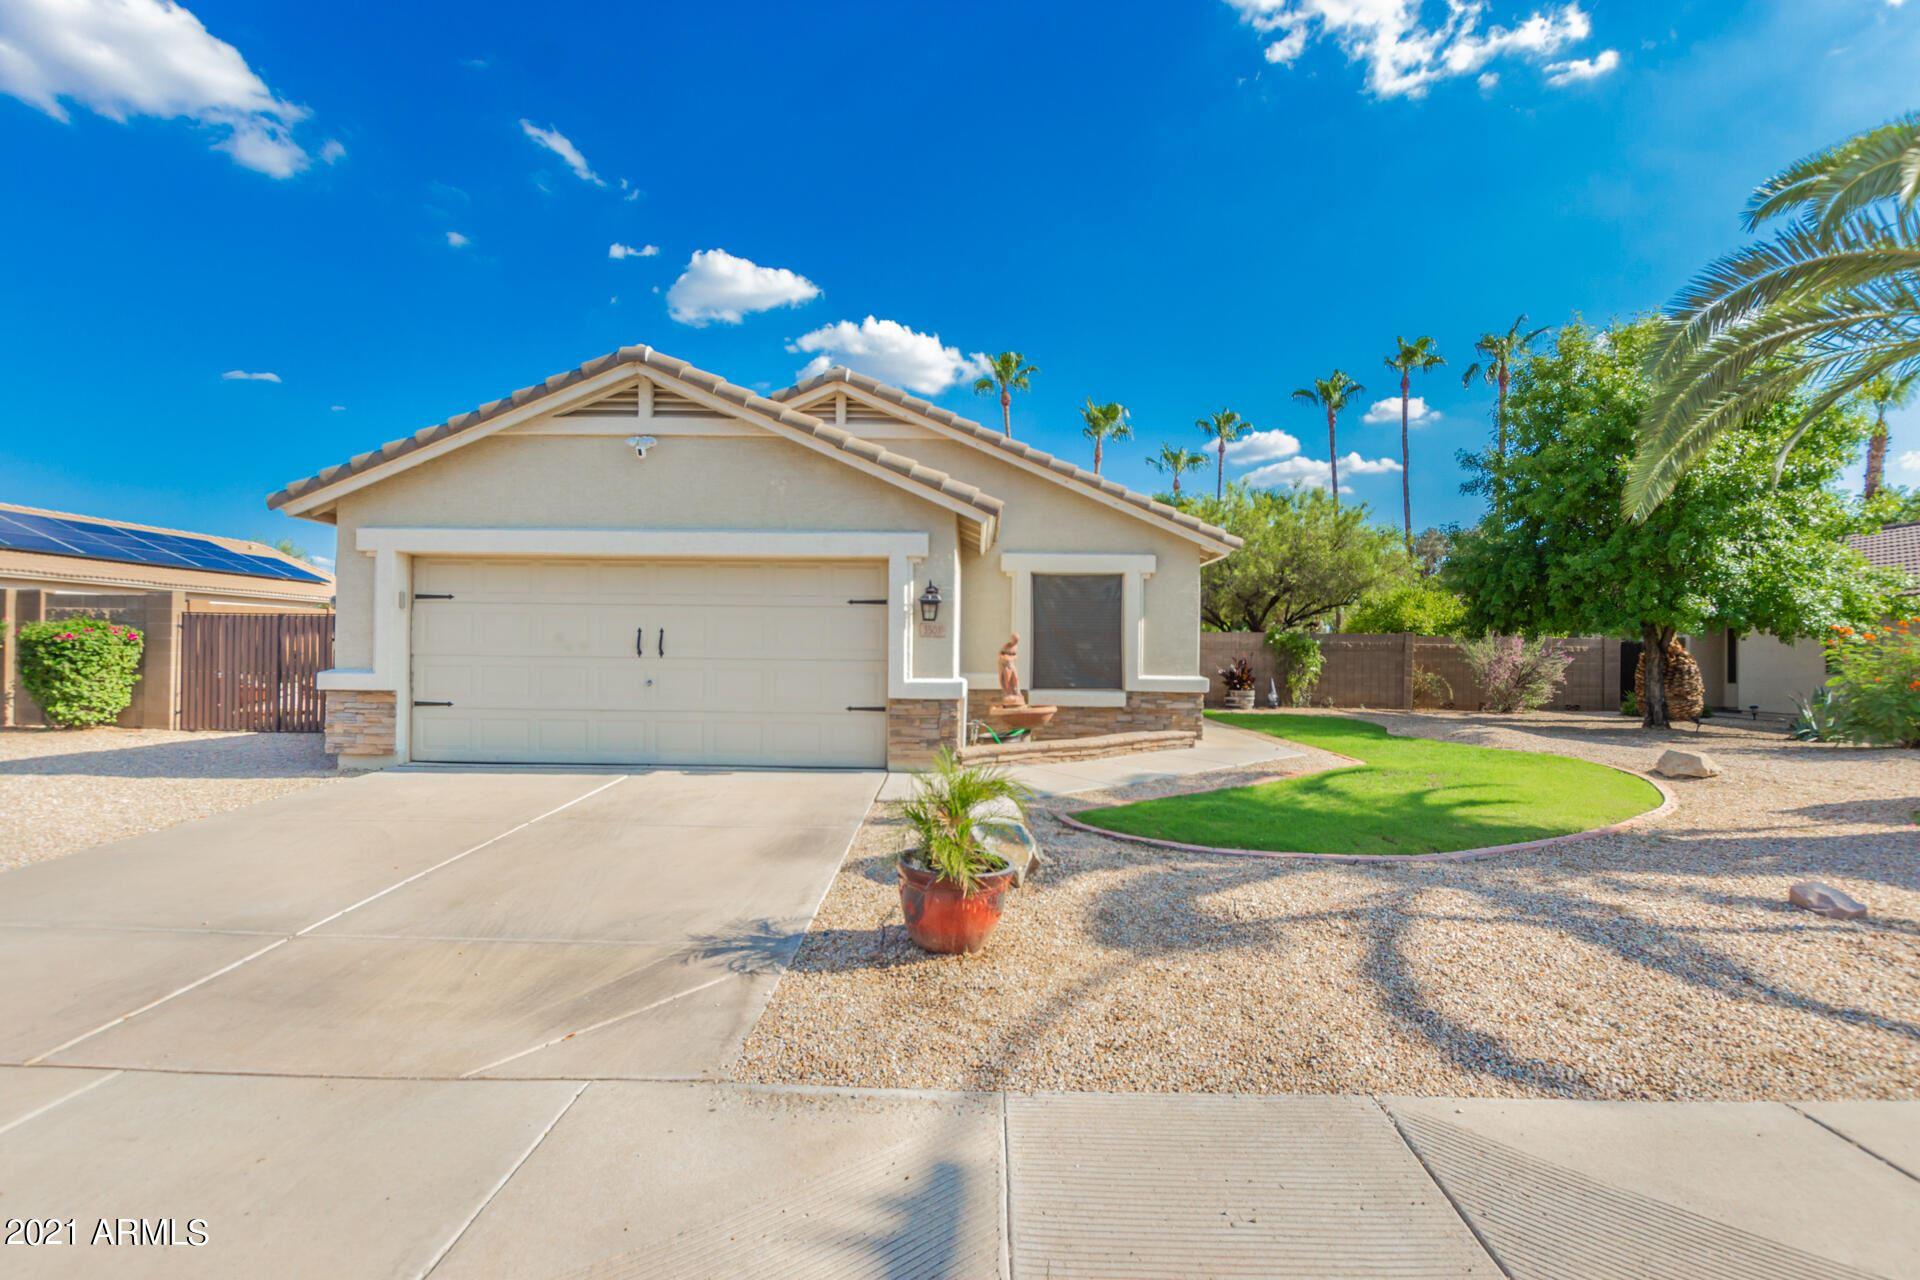 3501 E MARCO POLO Road, Phoenix, AZ 85050 - MLS#: 6269881